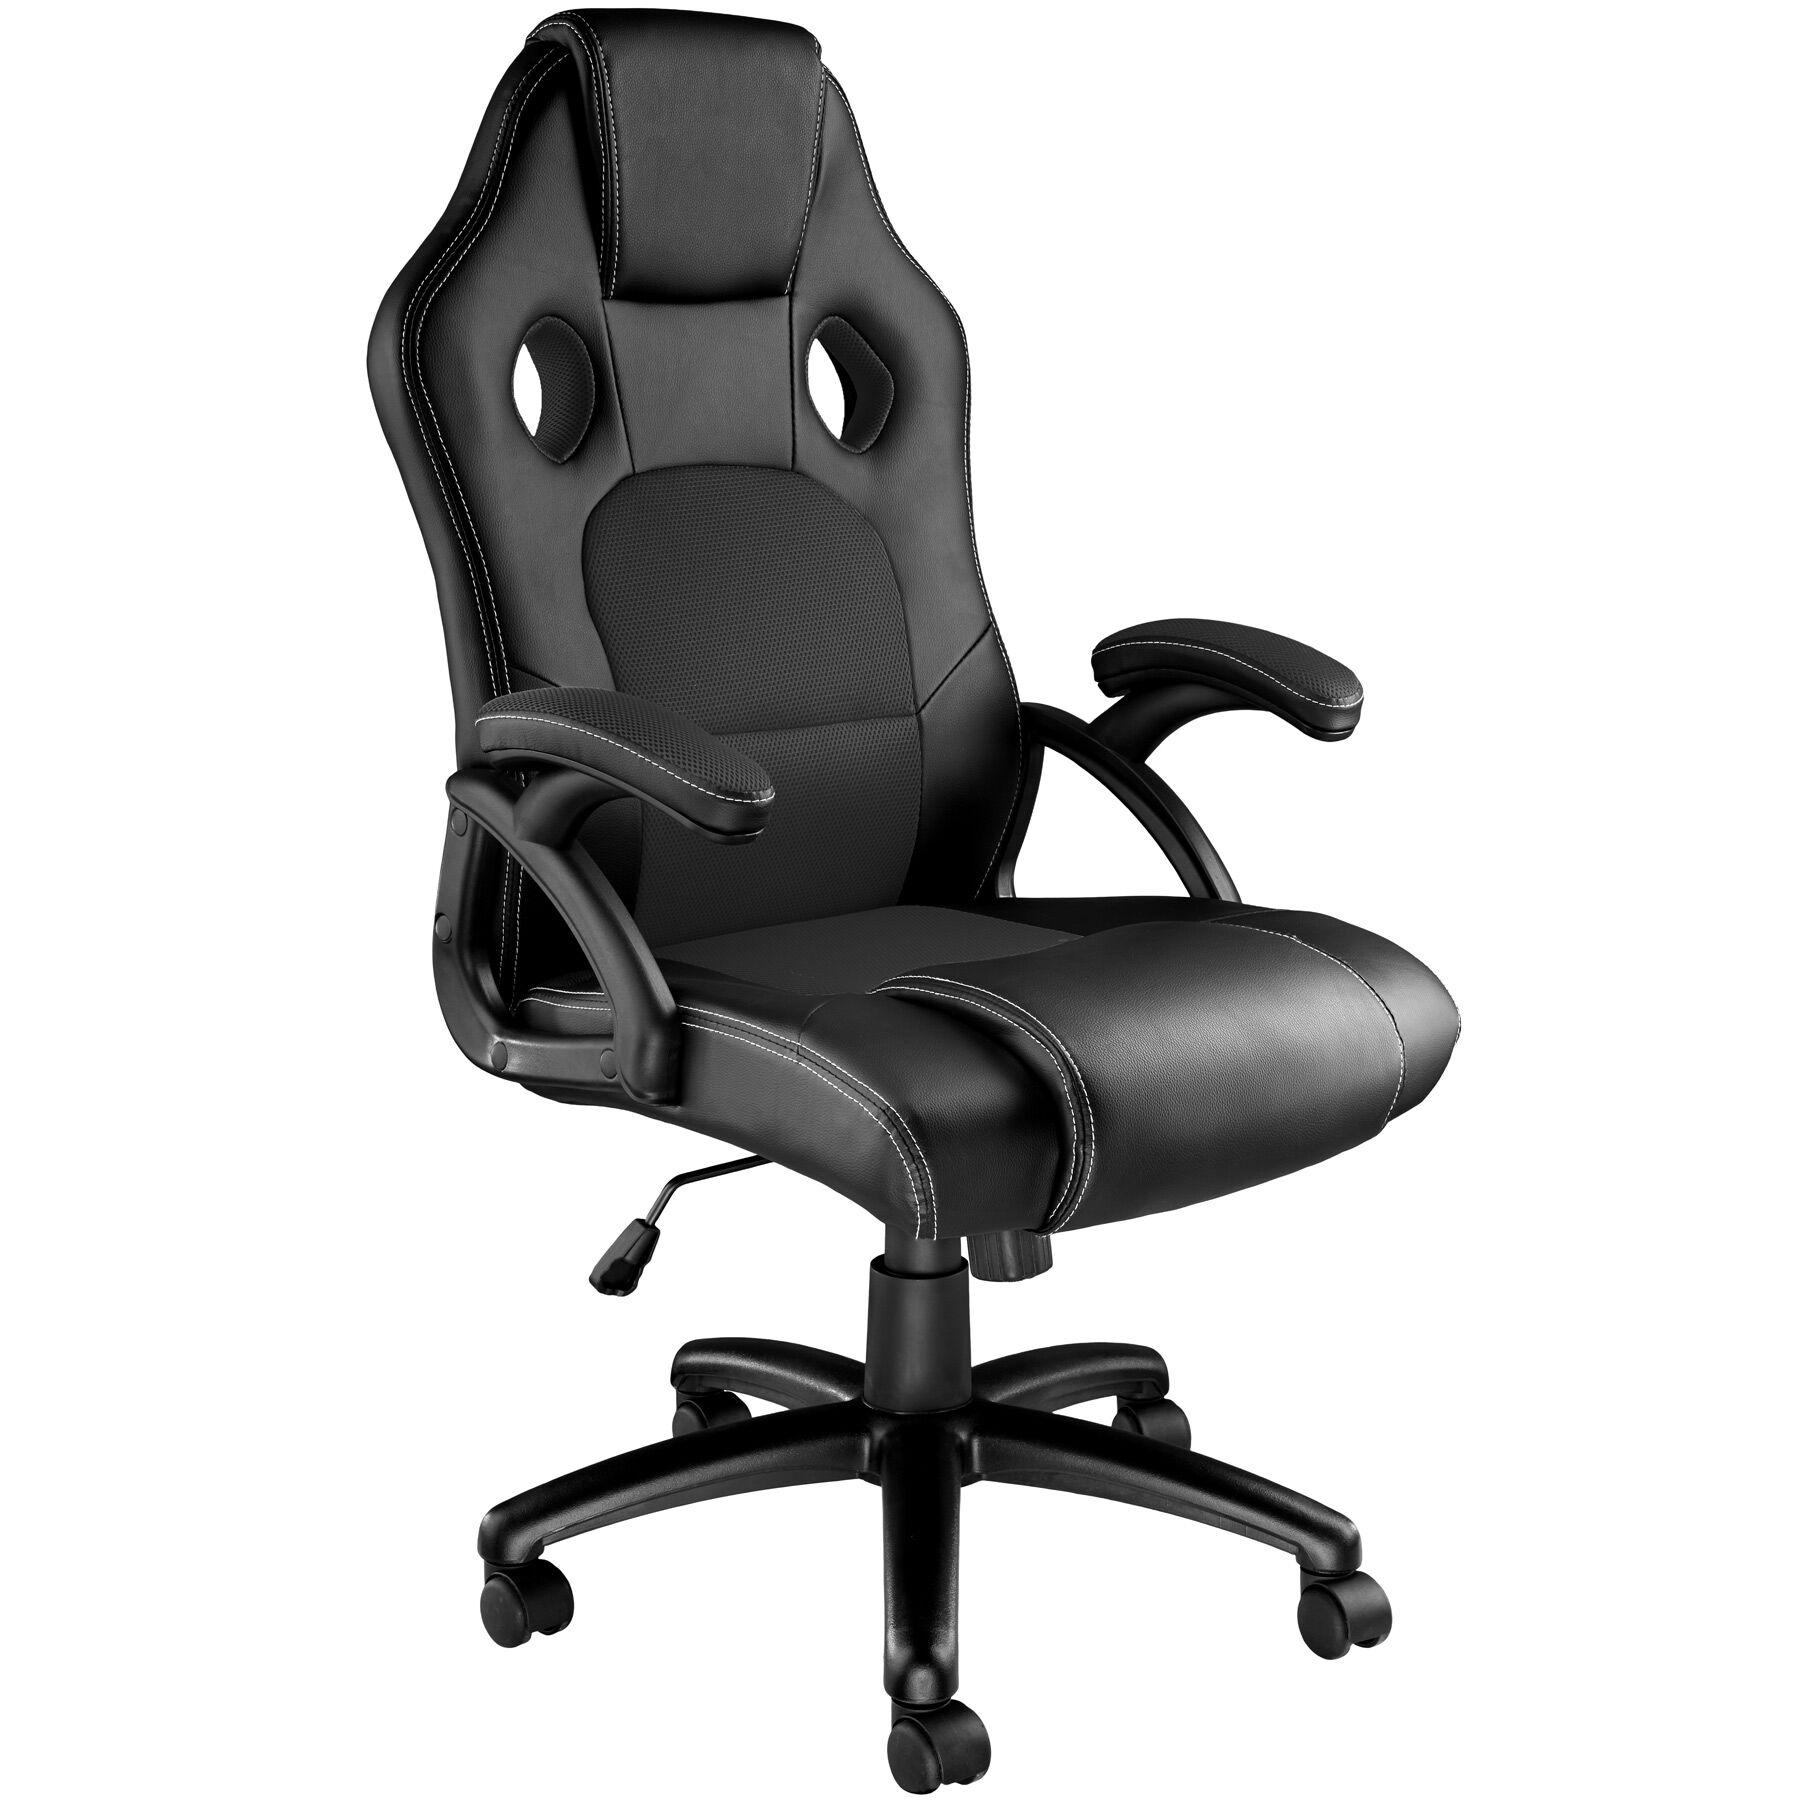 tectake Tyson Office Chair - black